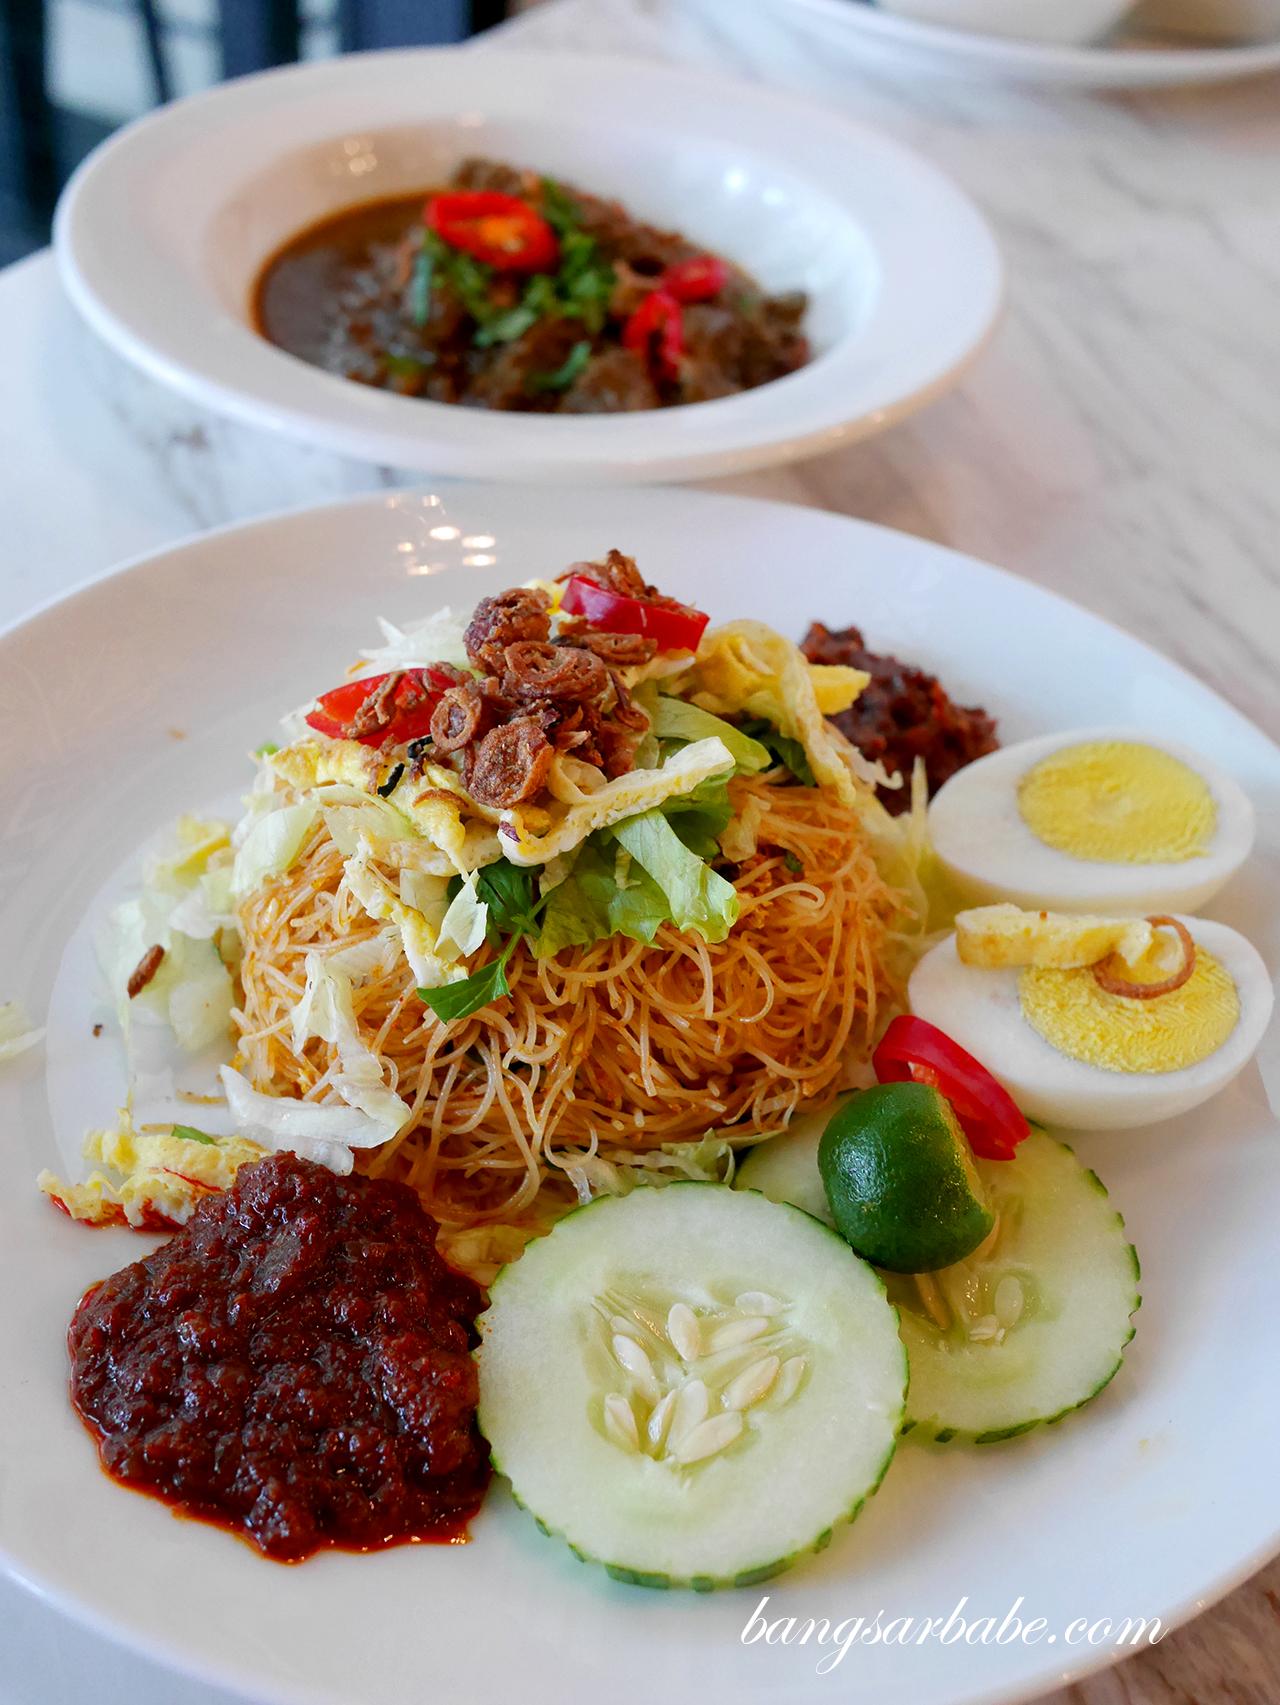 Meehoon Siam with Rendang Kambing